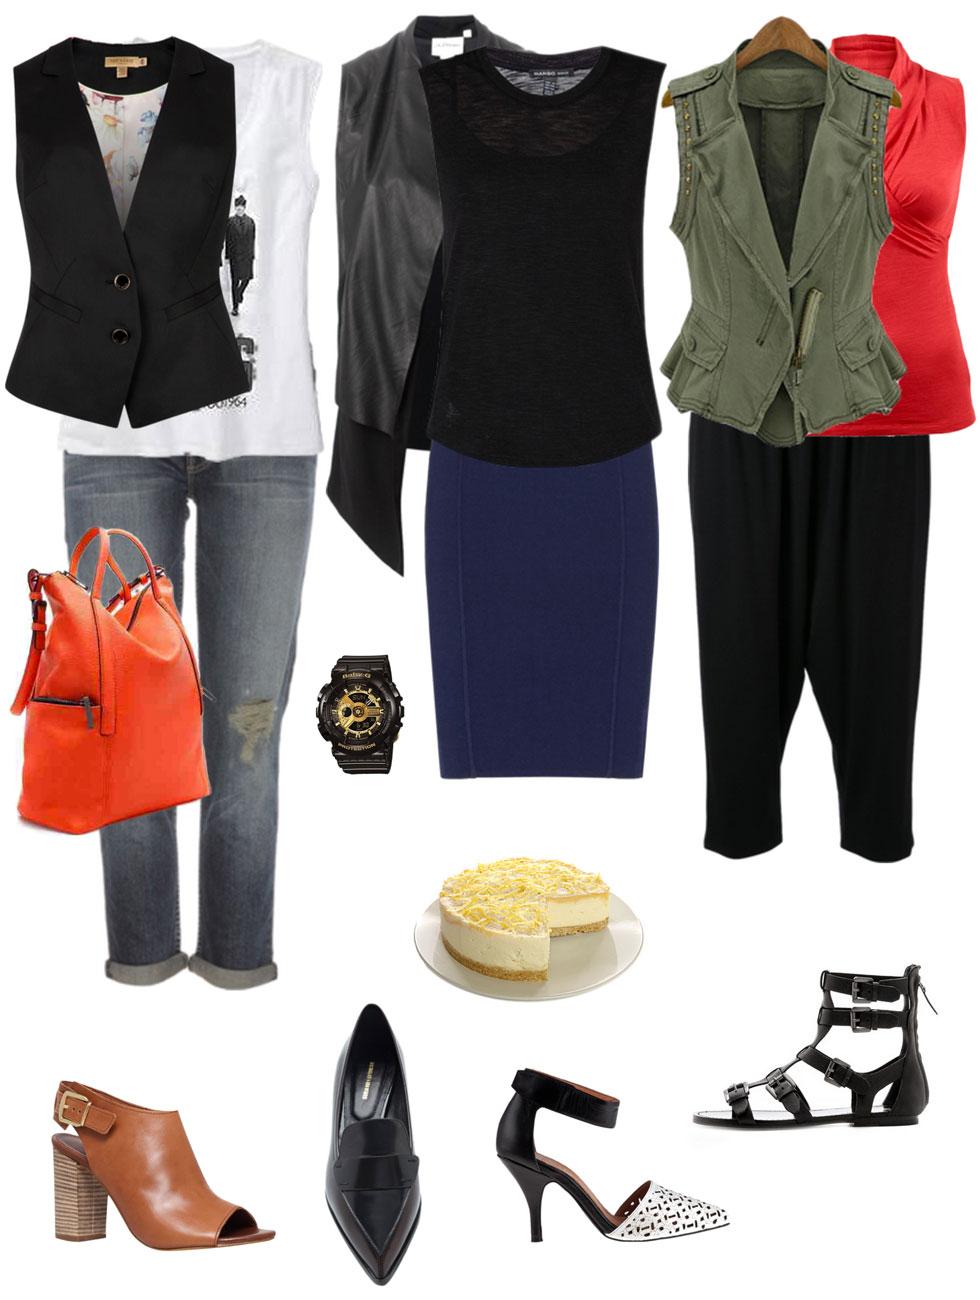 Ensemble: Sleeveless Top with Vest